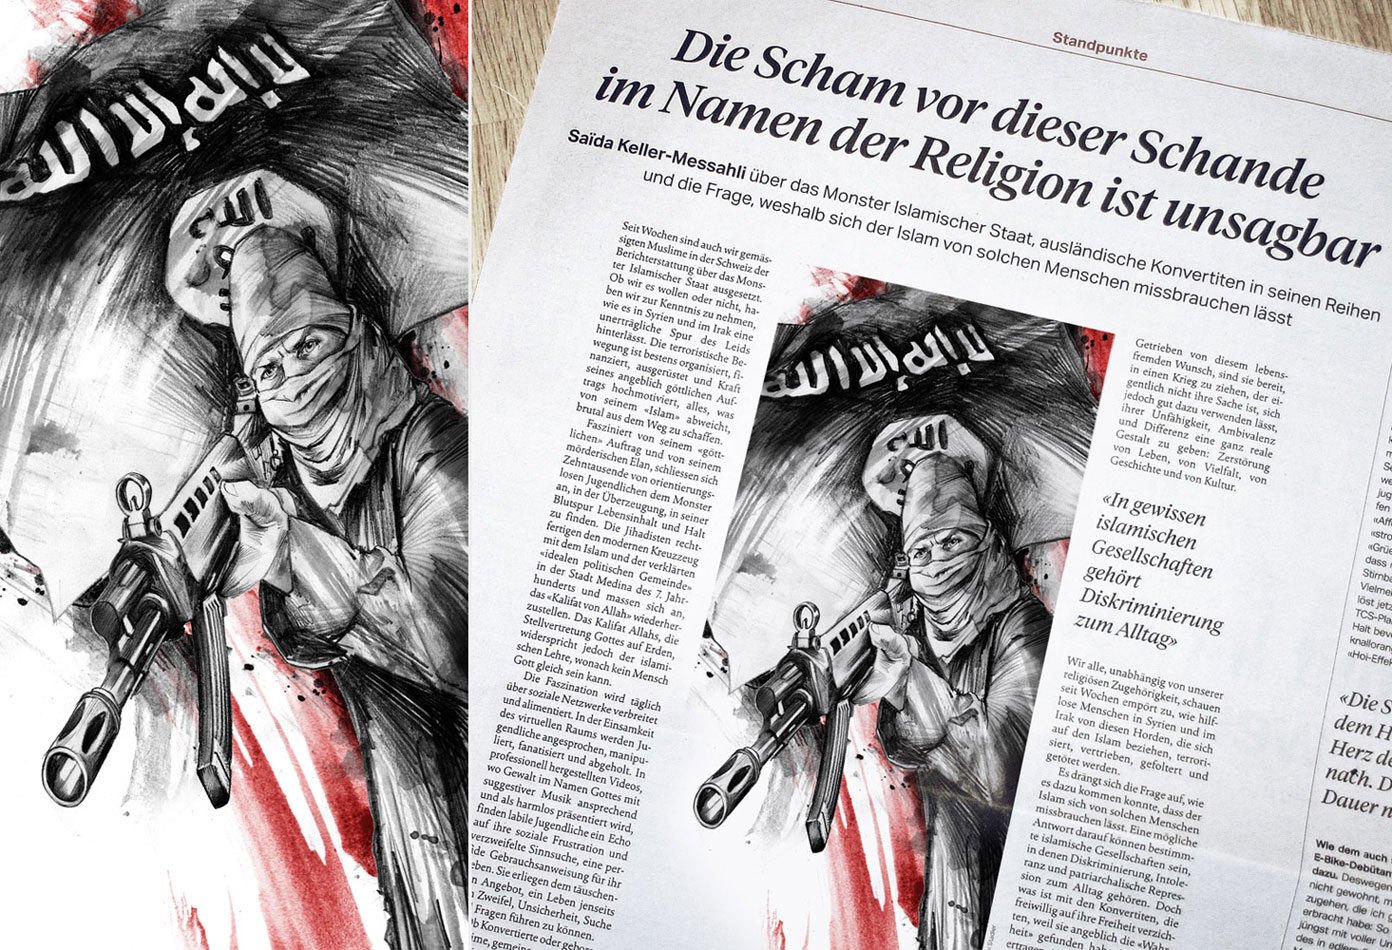 Isis1 - Kornel Illustration | Kornel Stadler portfolio